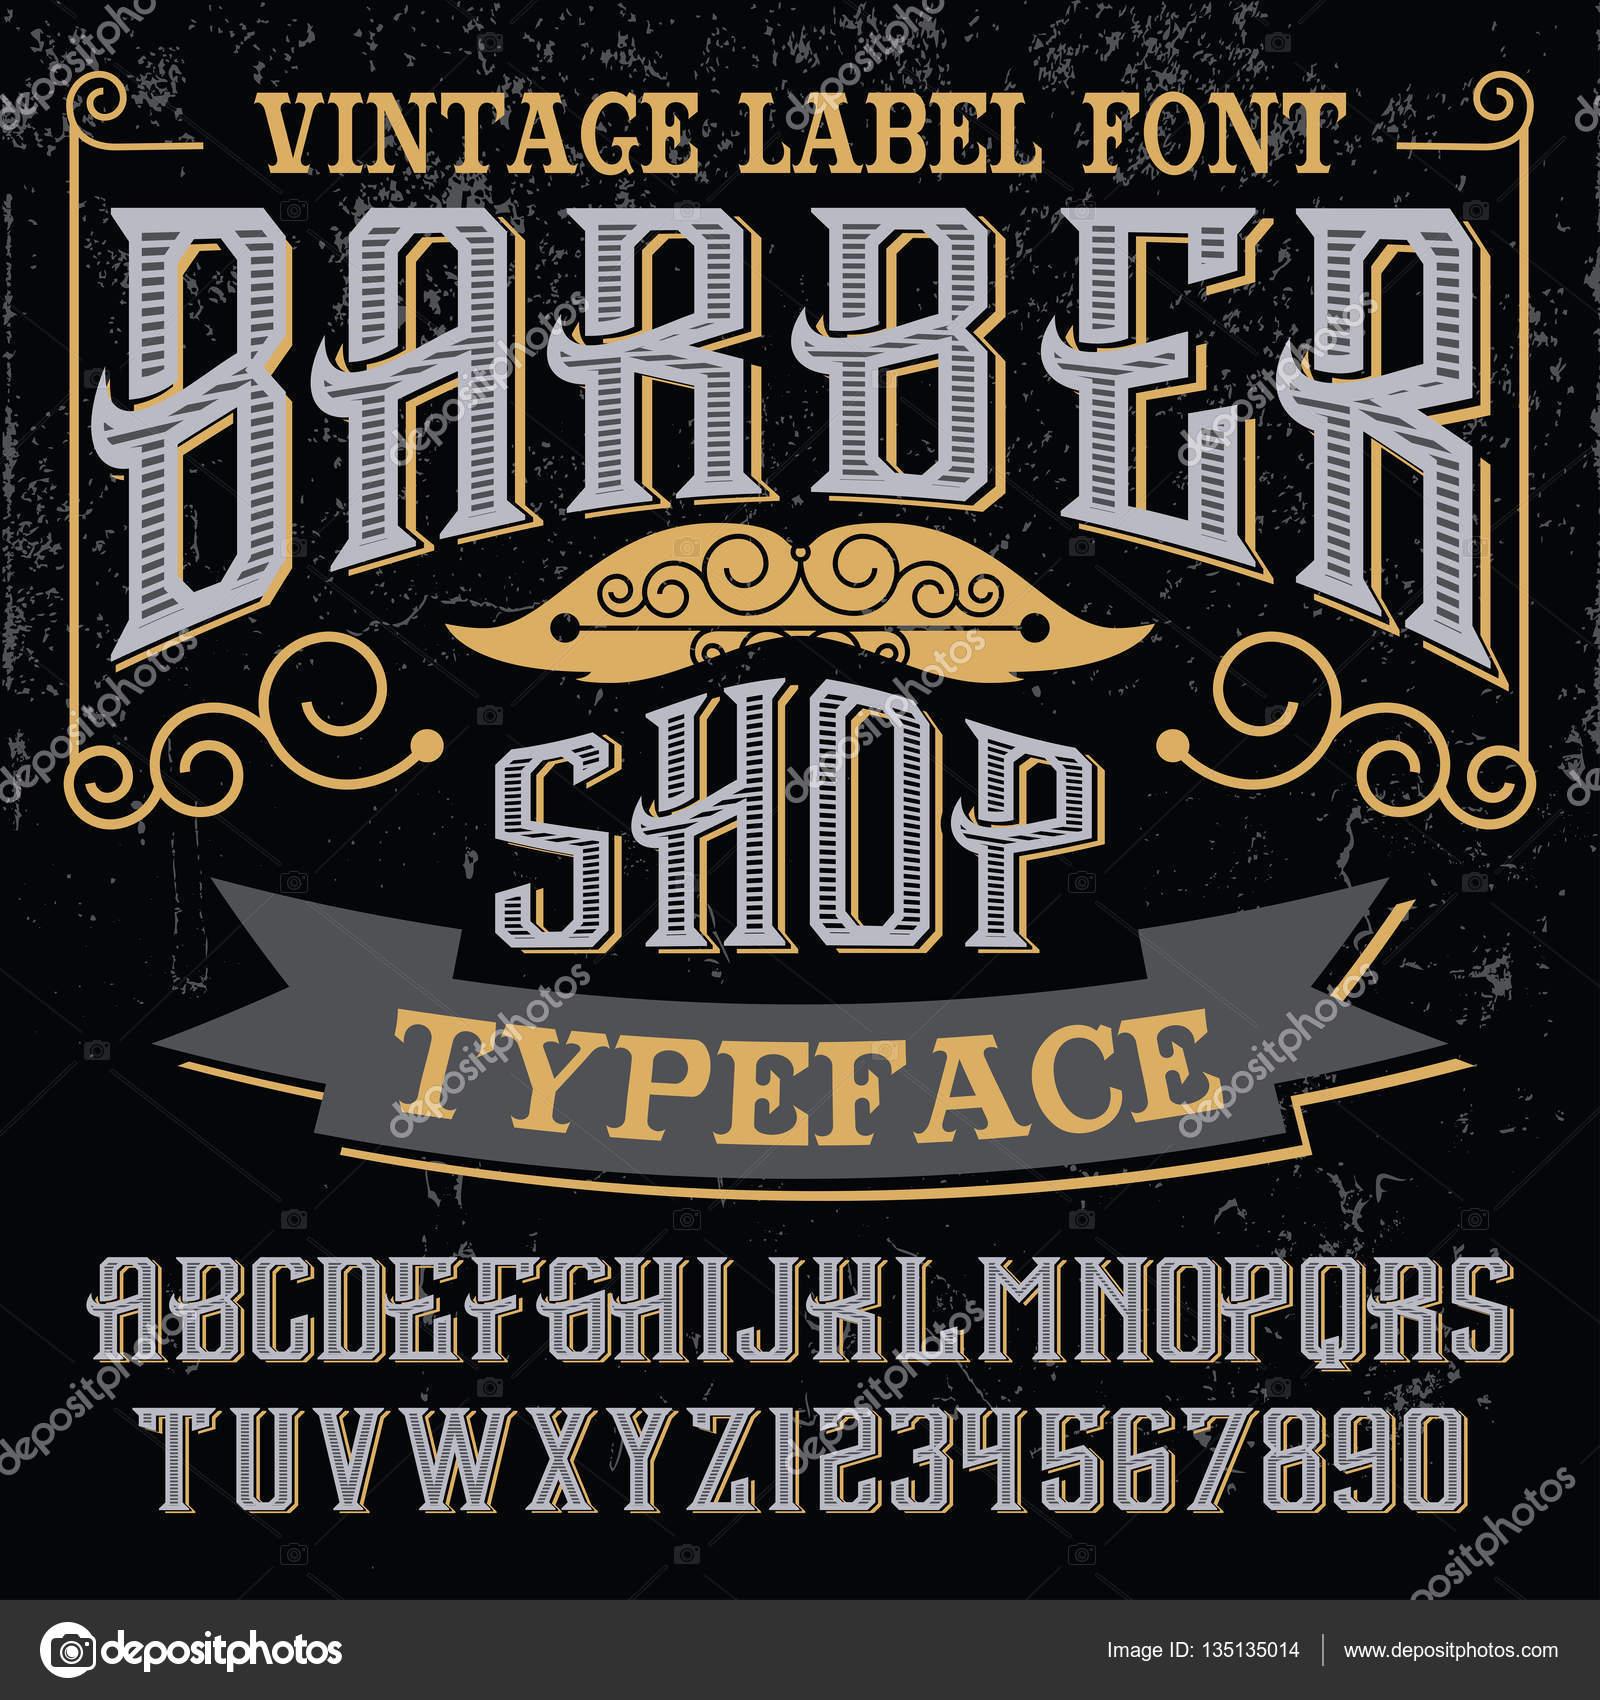 Artesanal de barbearia vintage fonte — Vetores de Stock © bowxwod